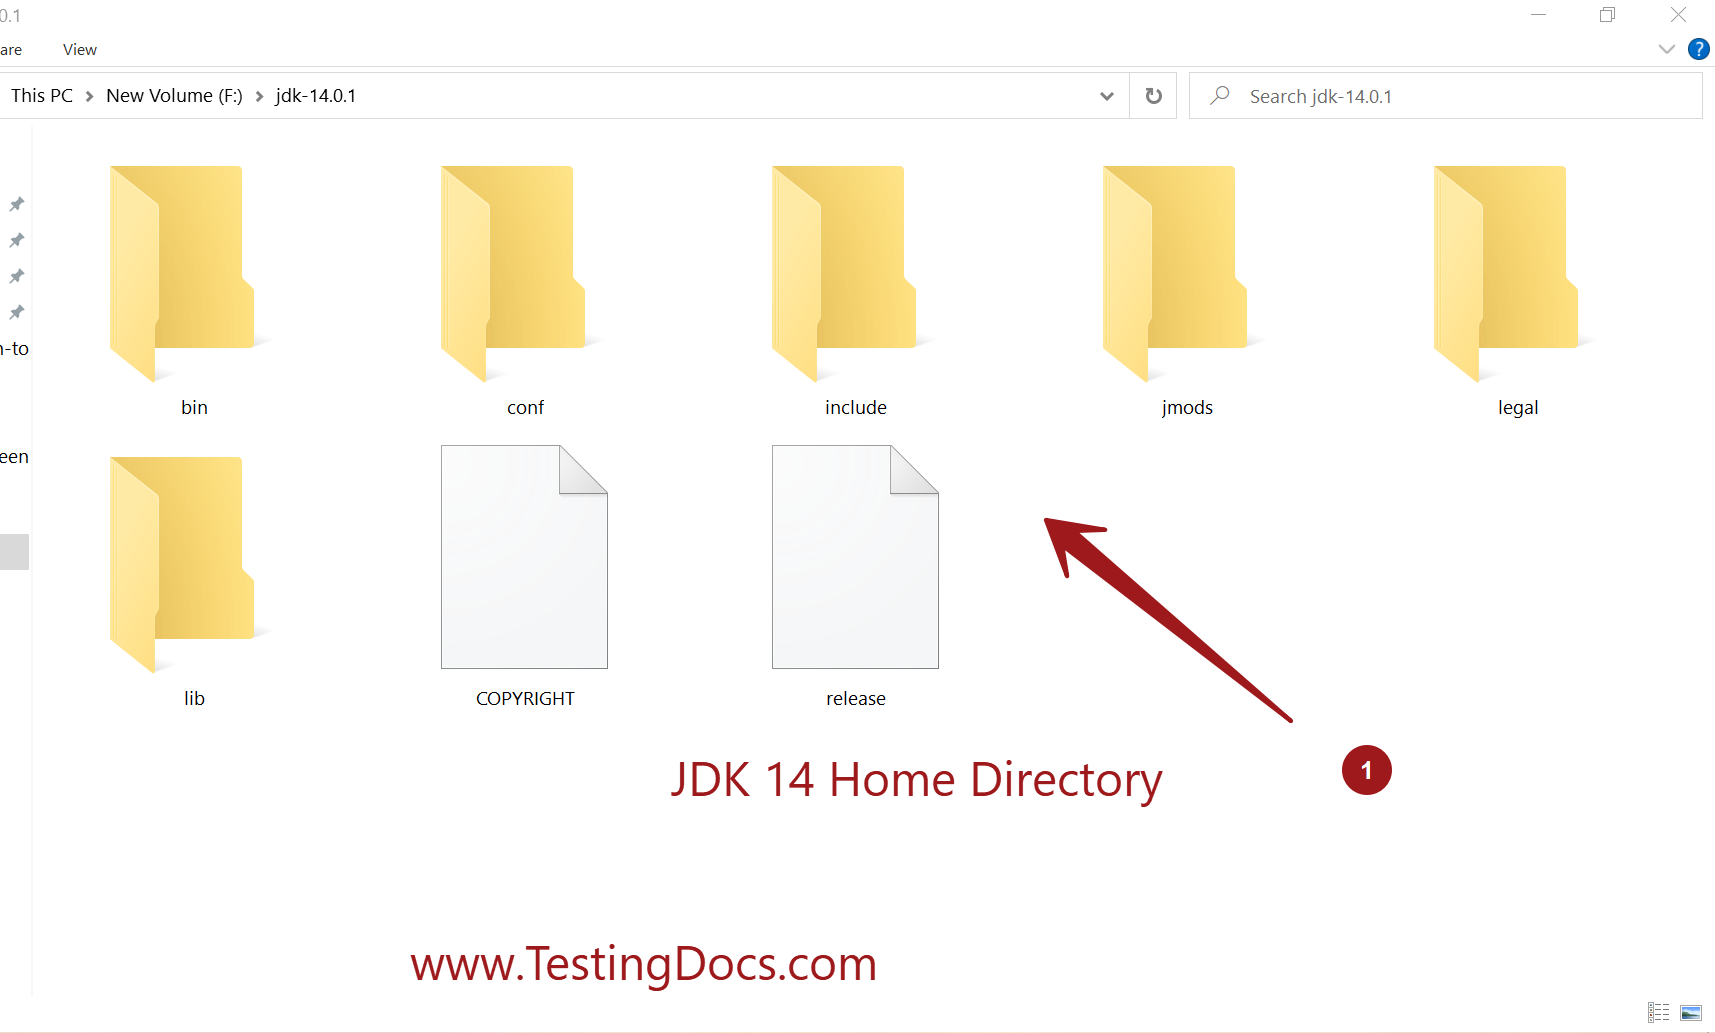 JDK 14 Home Directory